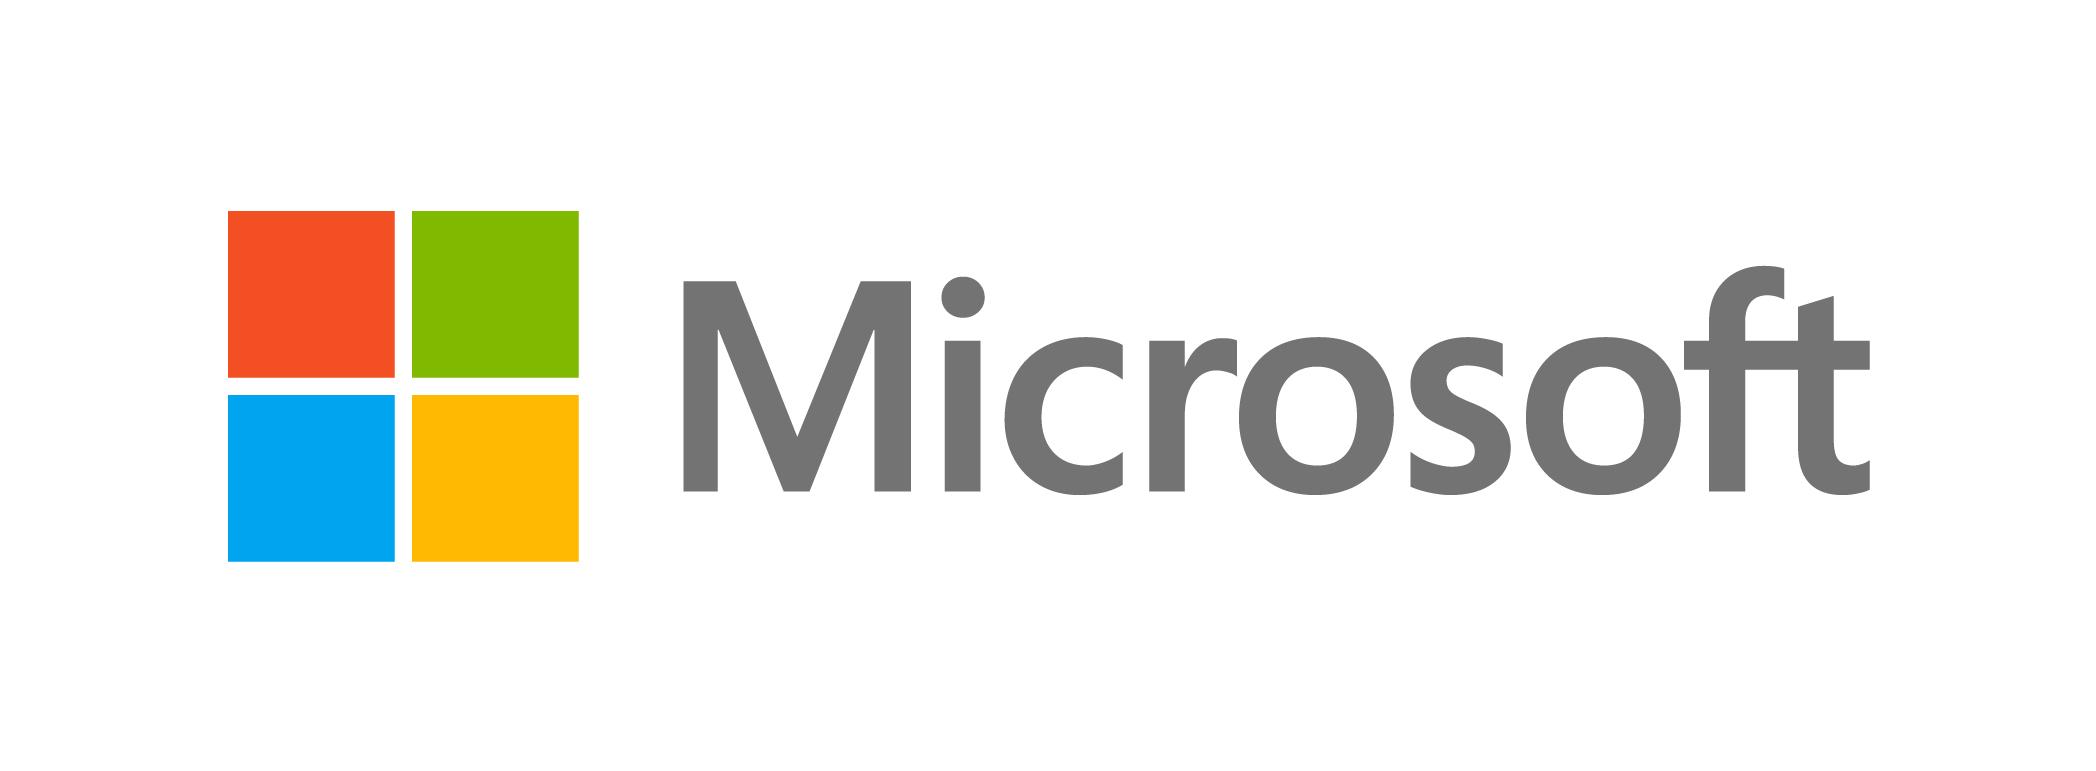 LENOVO DCG ROK MS Windows Server 2016 Datacenter 24 Core - Multilanguage